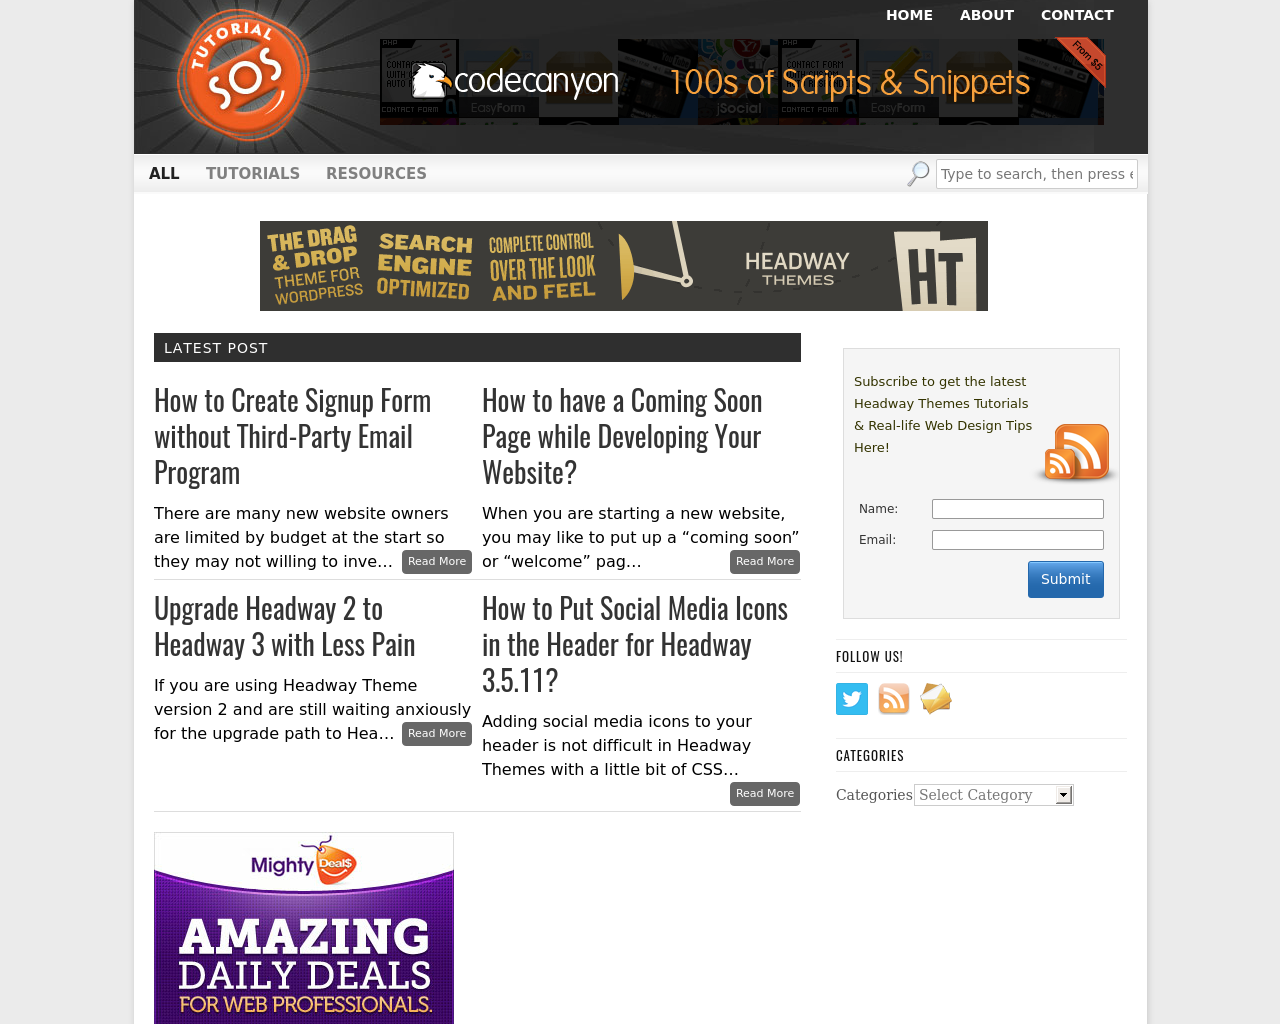 TutorialSOS-Advertising-Reviews-Pricing